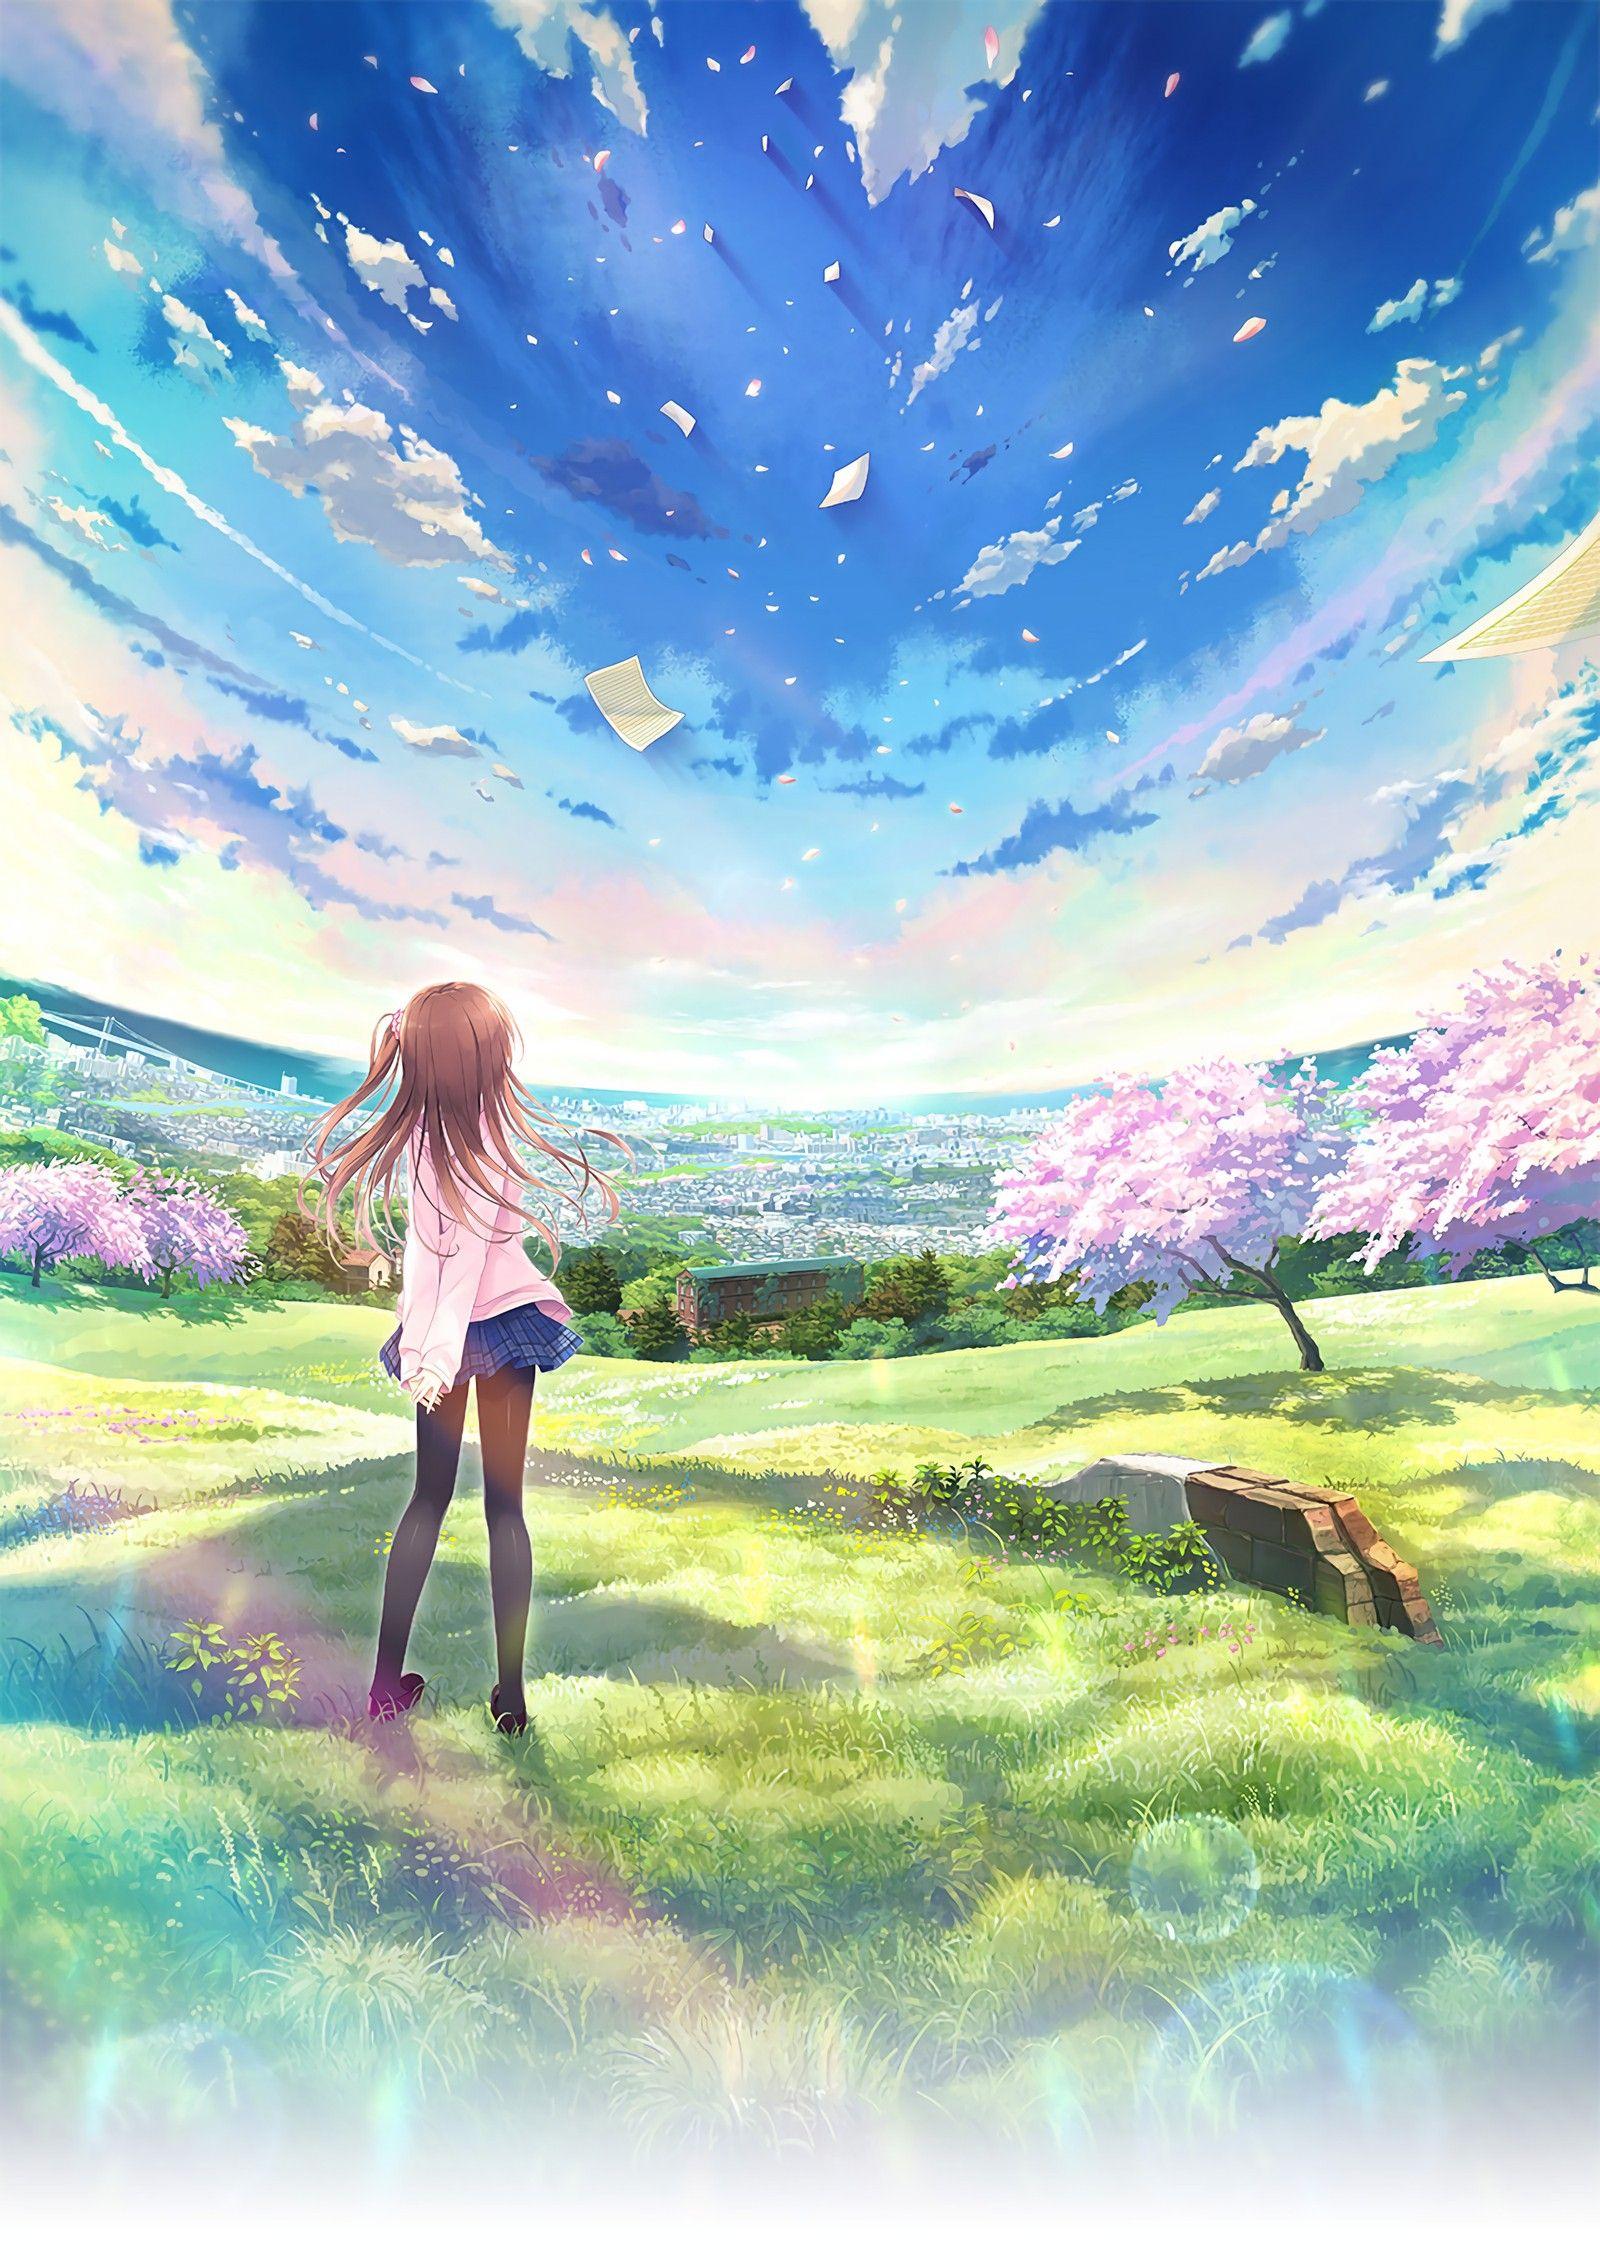 Popular Wallpaper Love Scenery - 485f6164a83d95a510ab49636f7cf708  Snapshot_446796.jpg